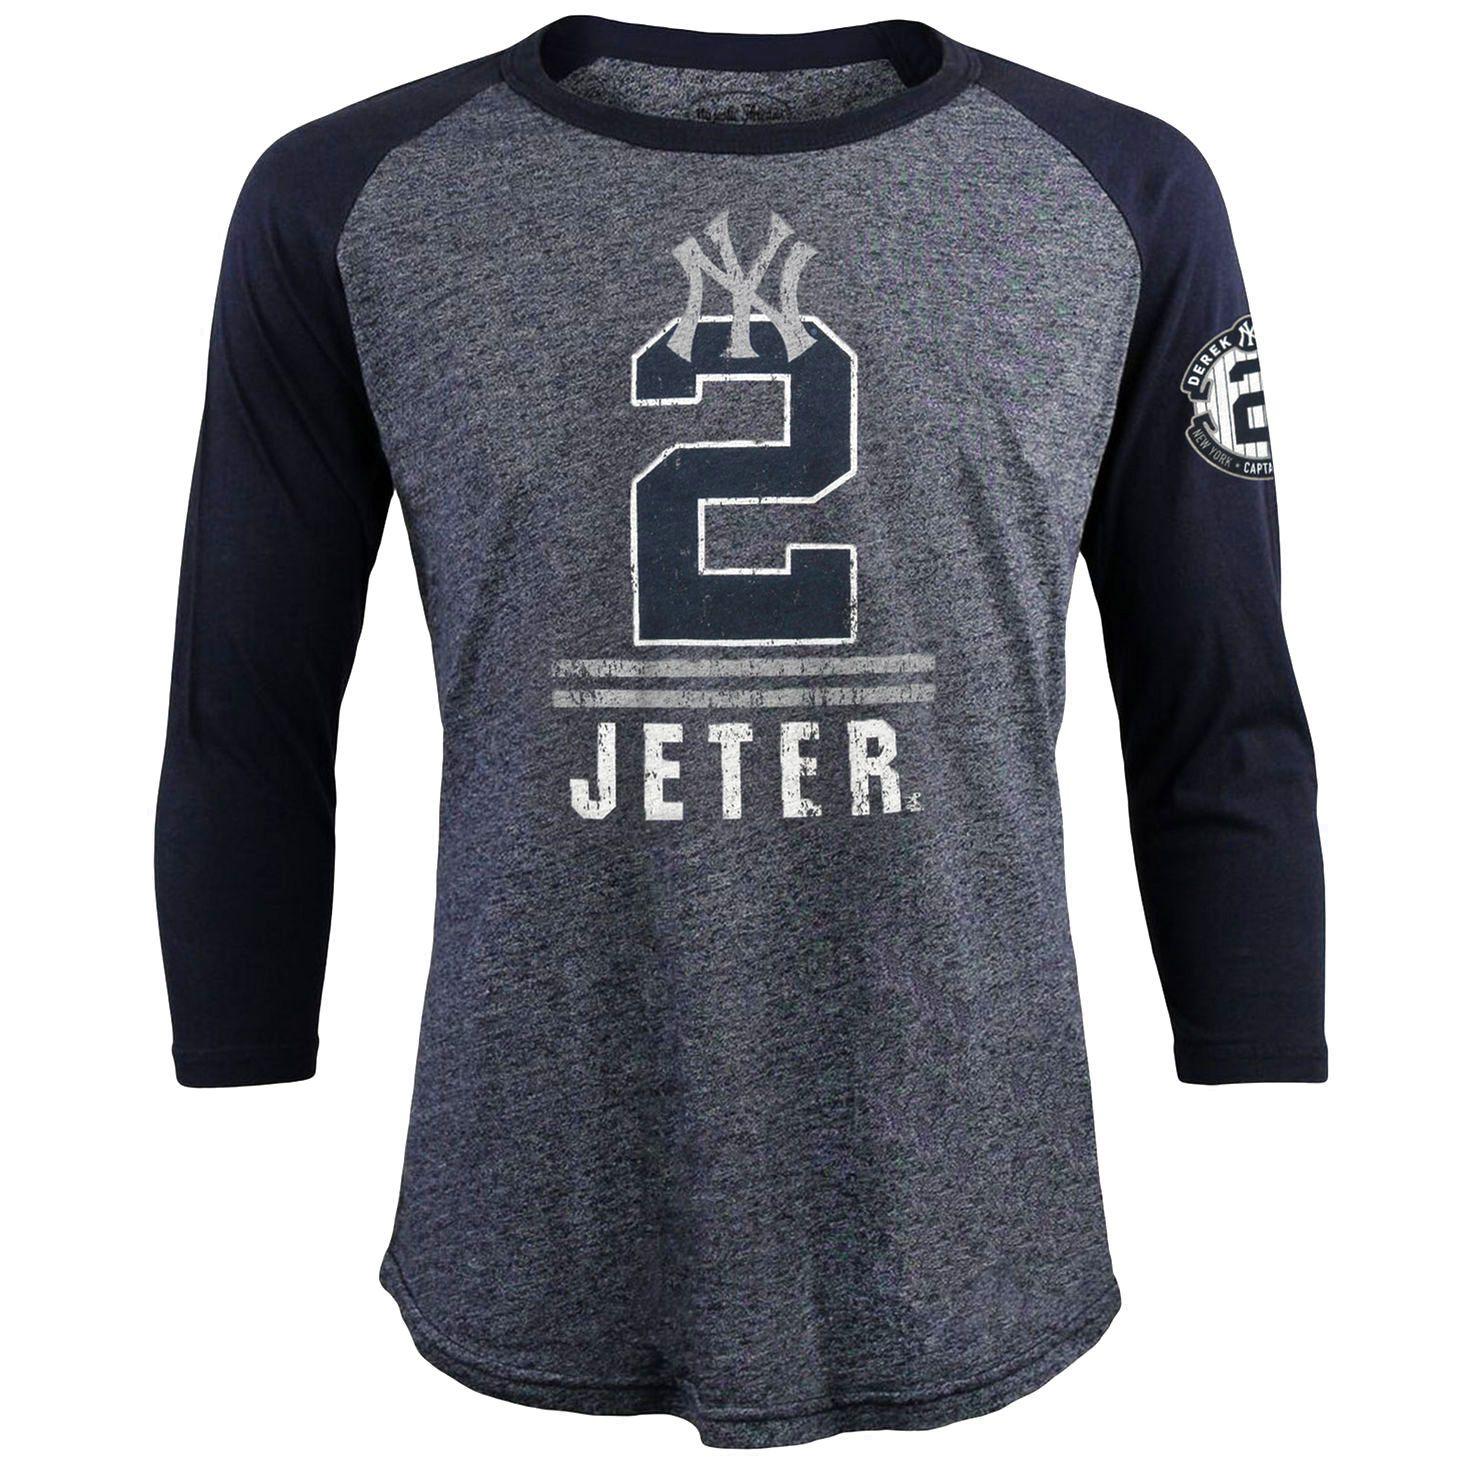 362356f5c Derek Jeter New York Yankees Majestic Threads Final Season Tri-Blend Raglan  T-Shirt - Heather Navy -  33.24